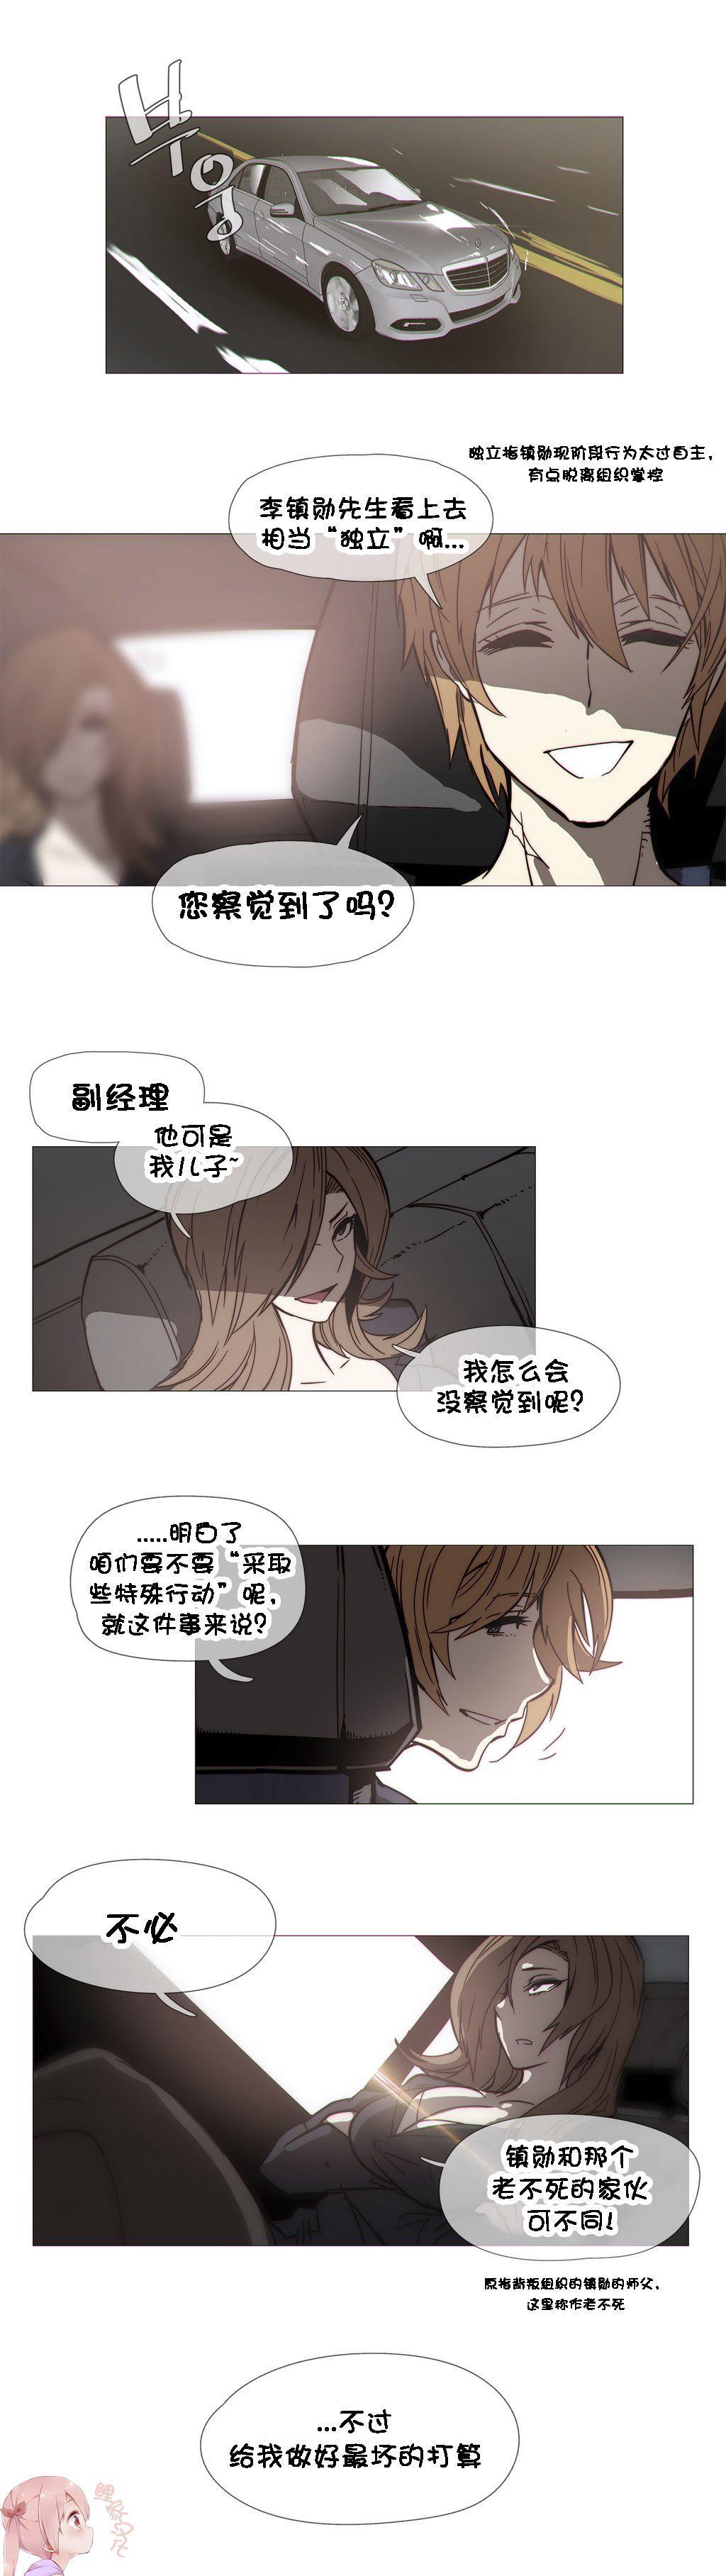 HouseHold Affairs 【卞赤鲤个人汉化】1~33话(持续更新中) 669